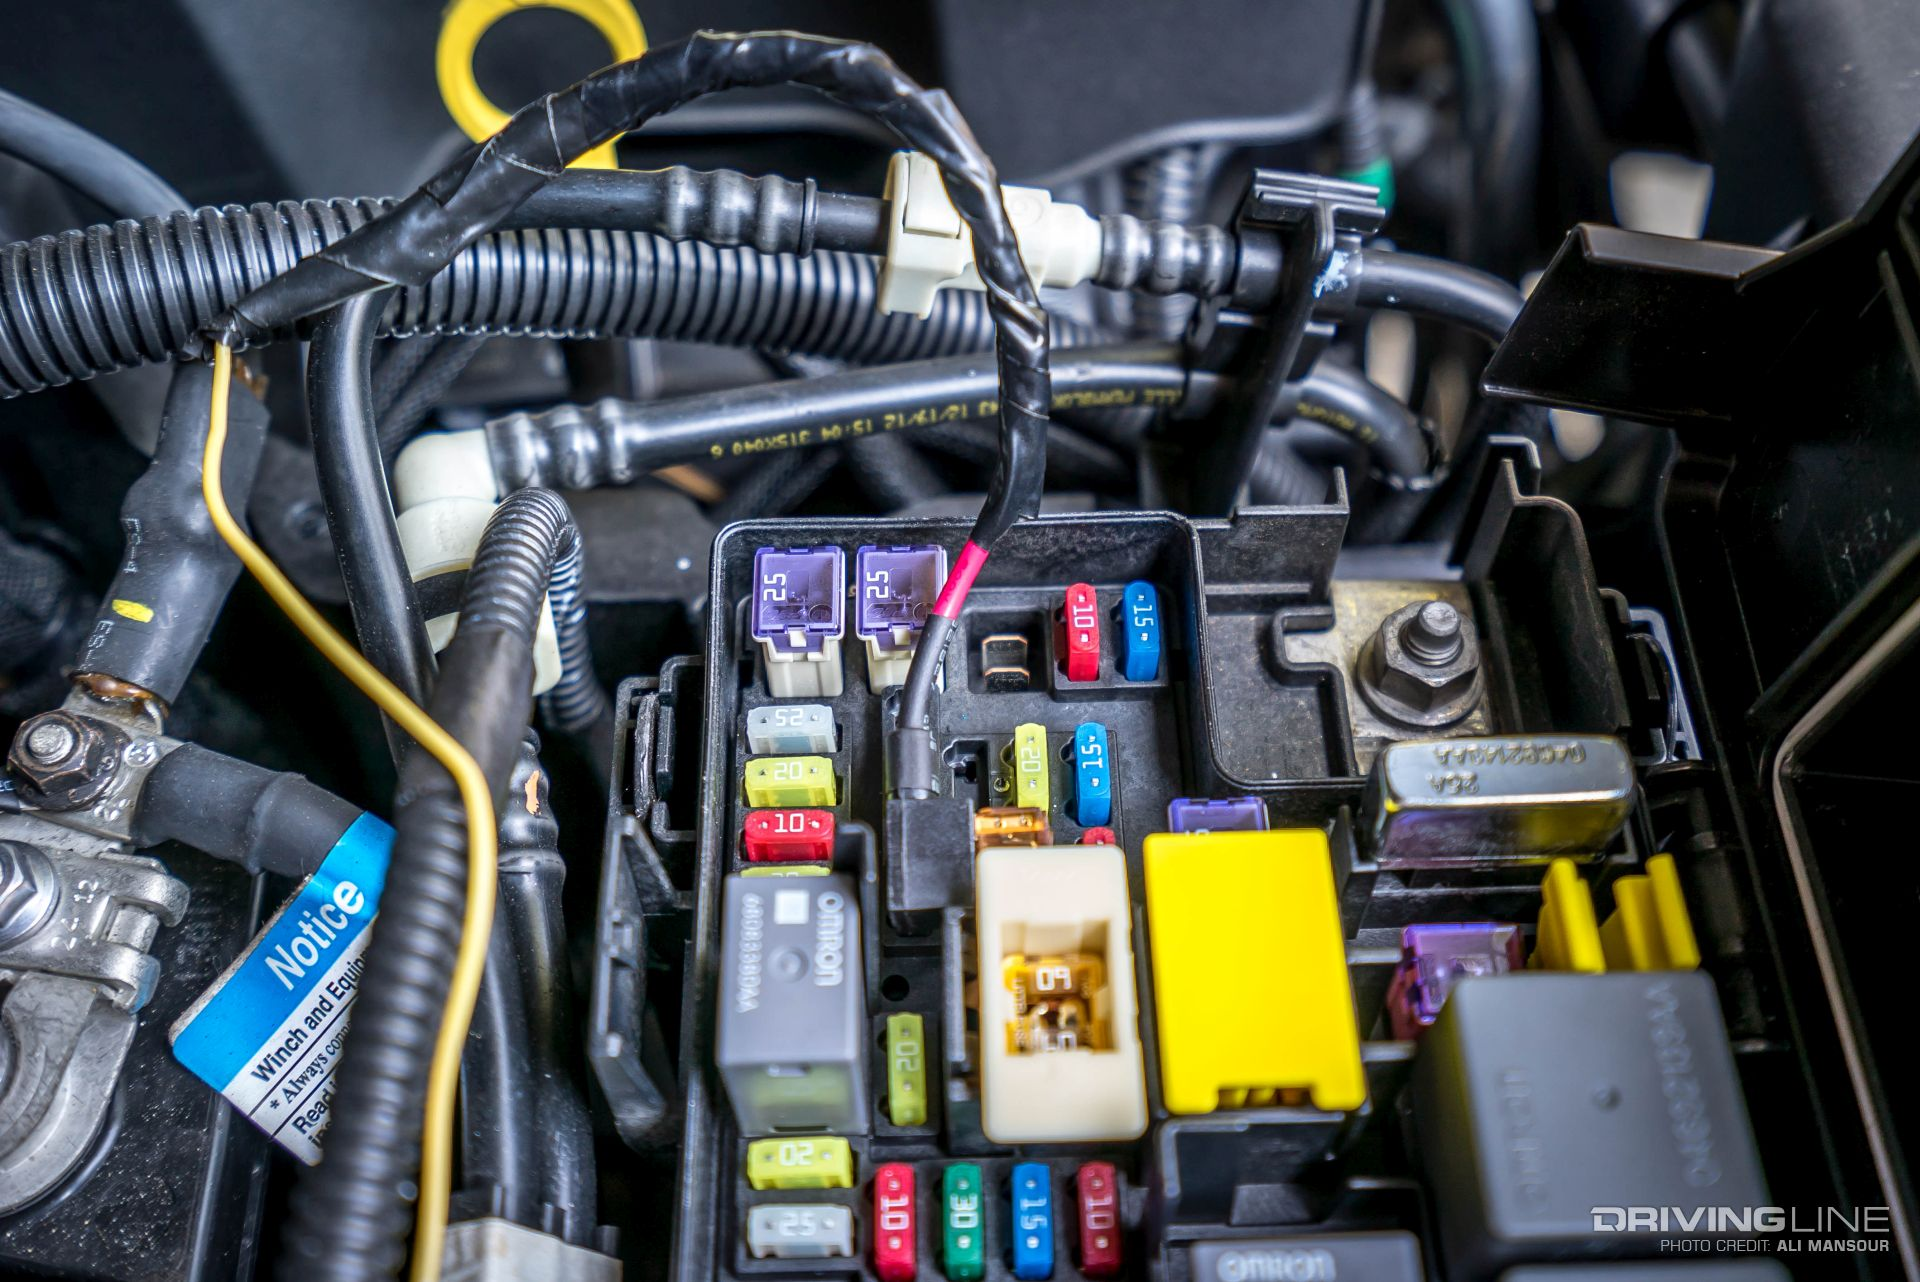 [DIAGRAM_38EU]  ARB AR21 Intensity Light Review   DrivingLine   Arb Wiring Harness Lighting      DrivingLine